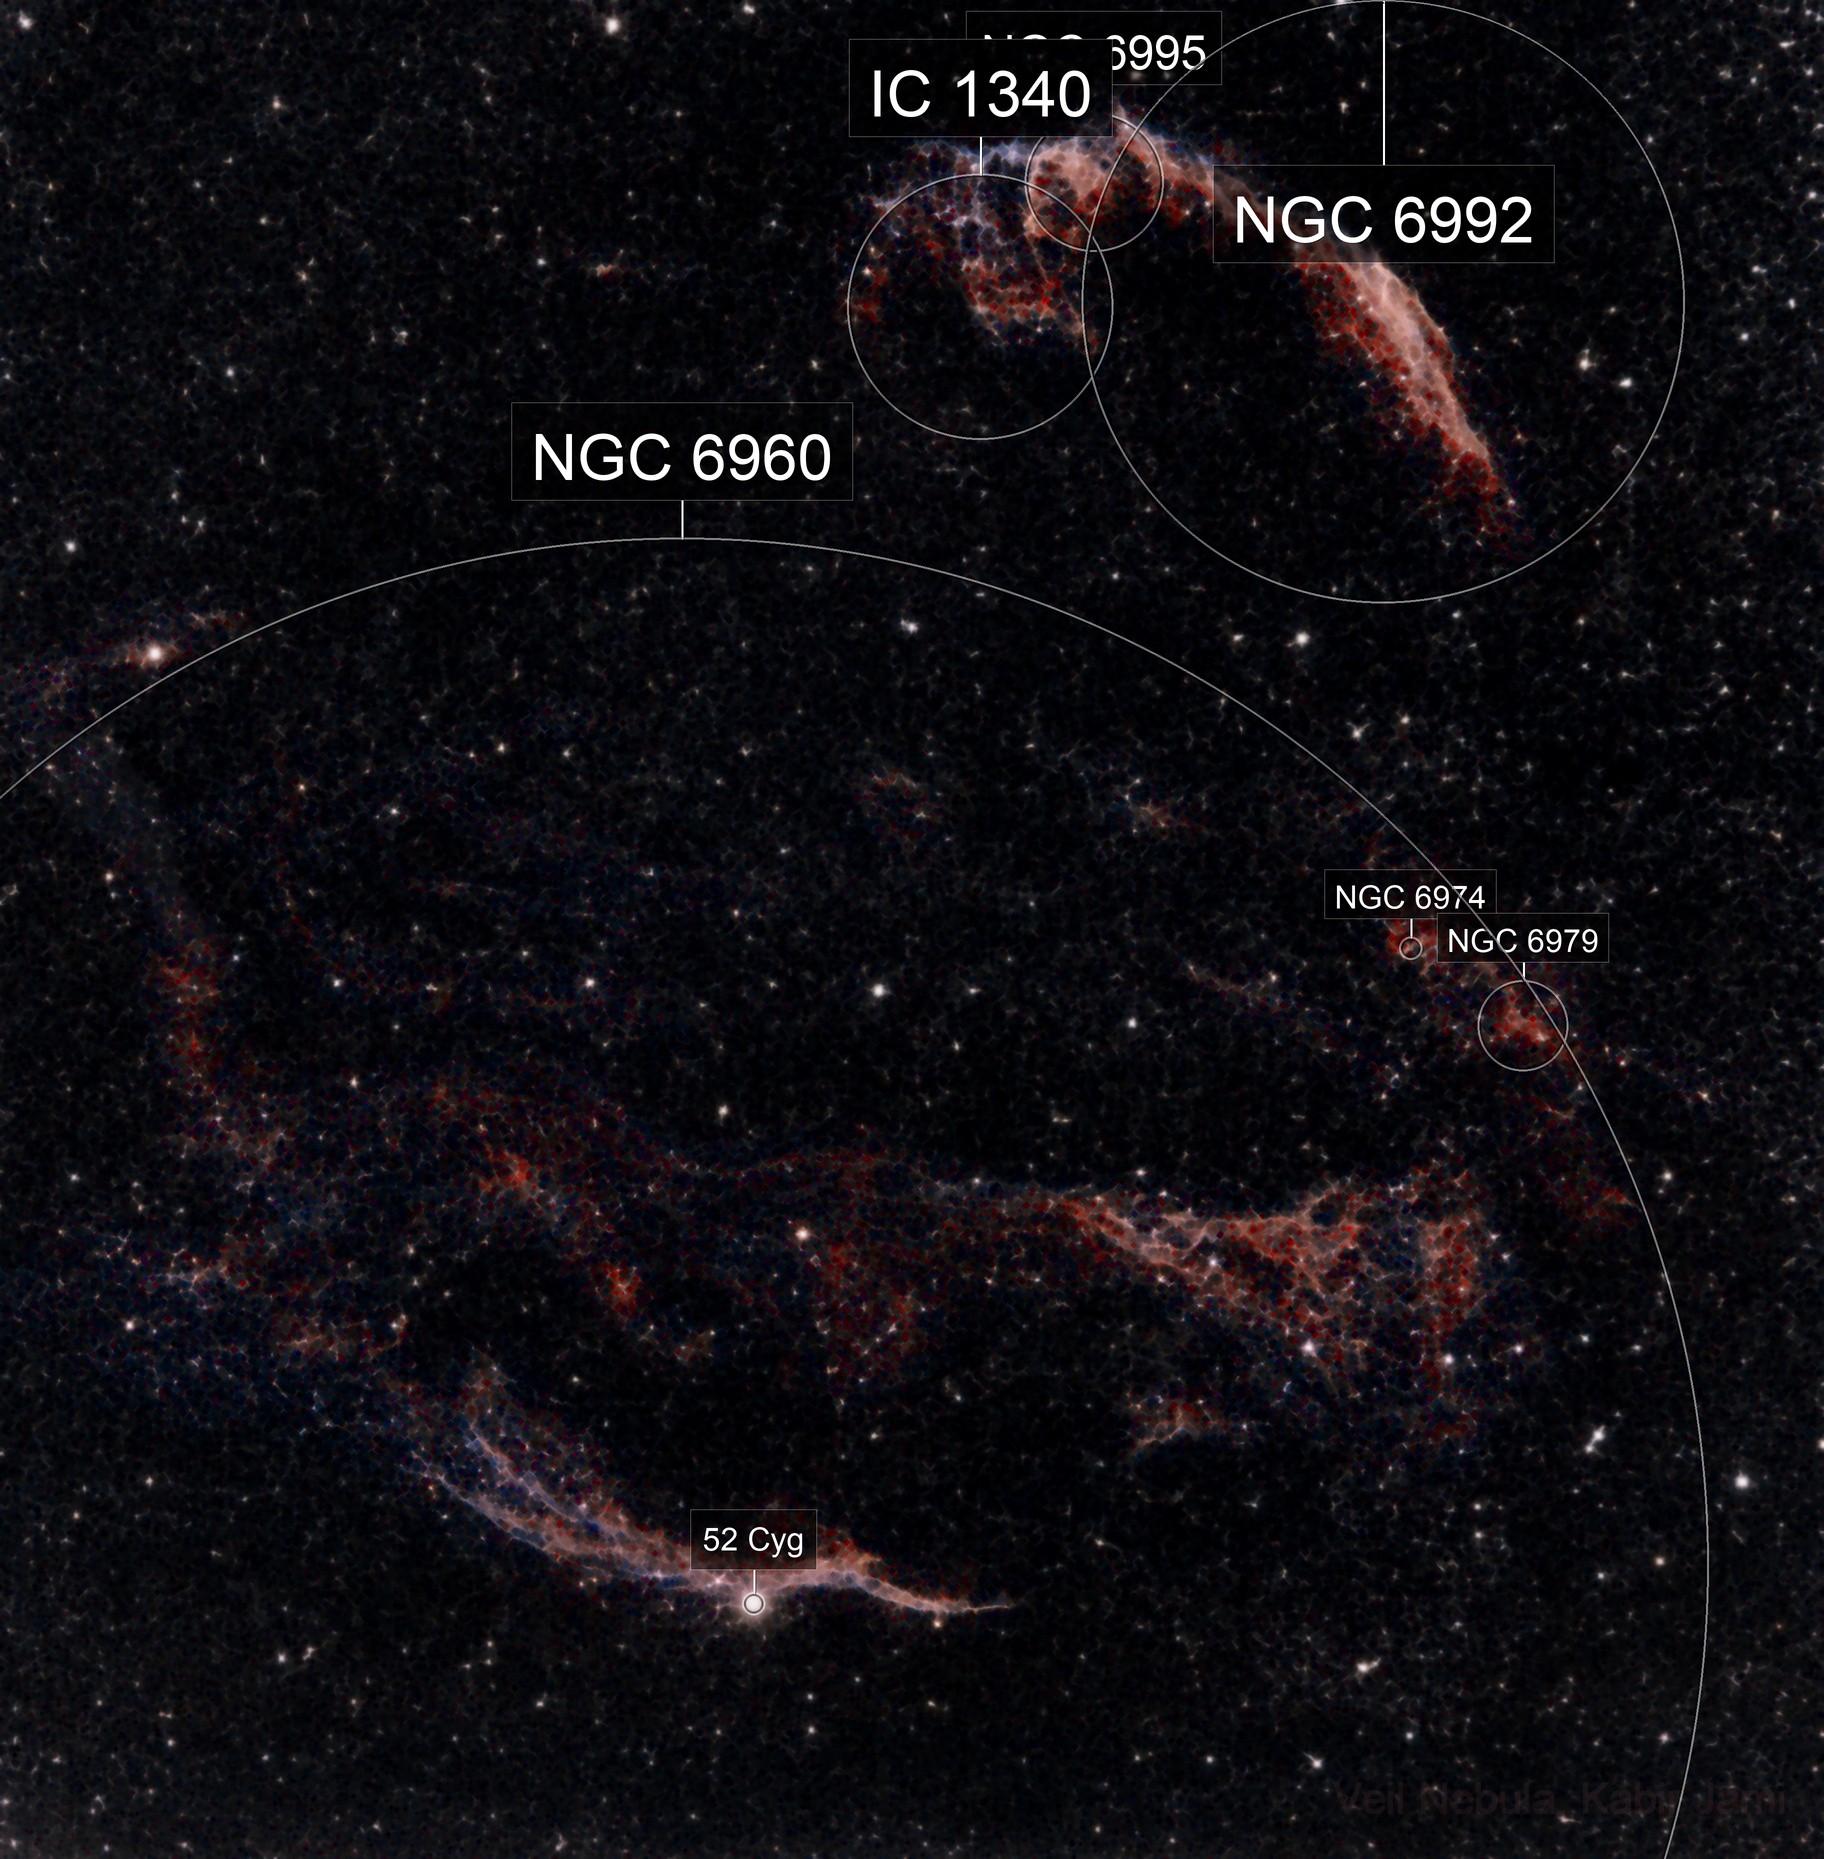 Veil nebula and the Cygnus Loop